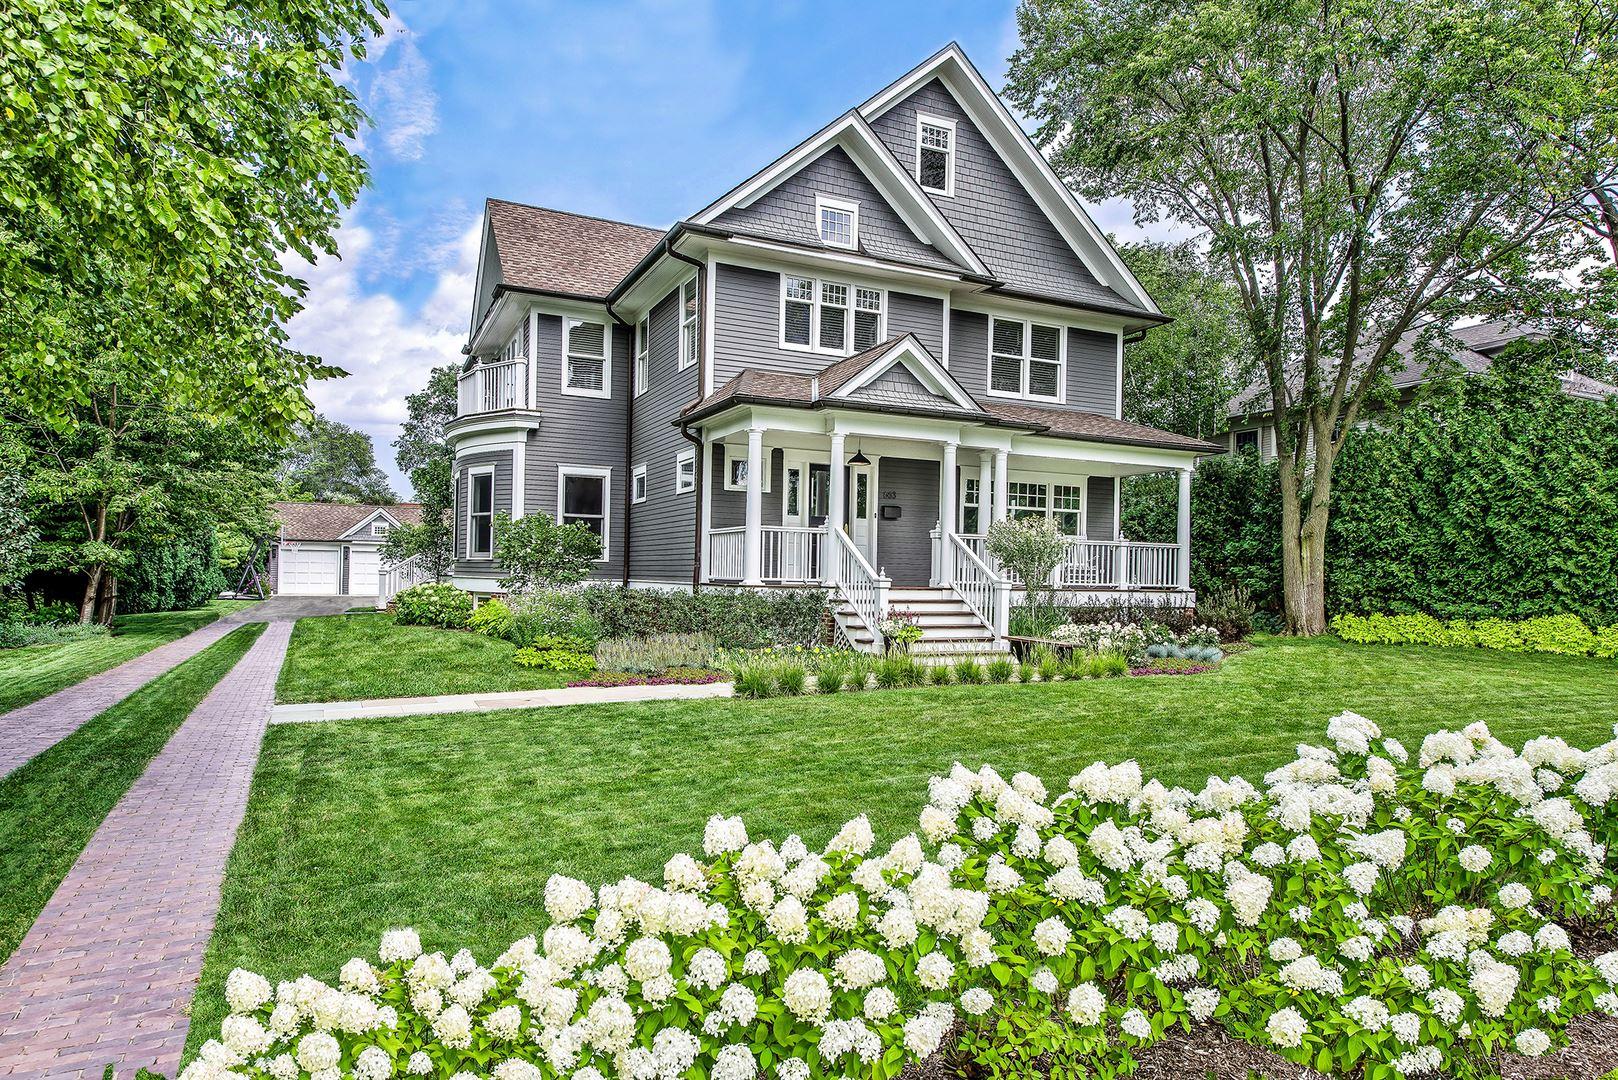 663 Greenwood Avenue, Glencoe, IL 60022 - #: 10709174